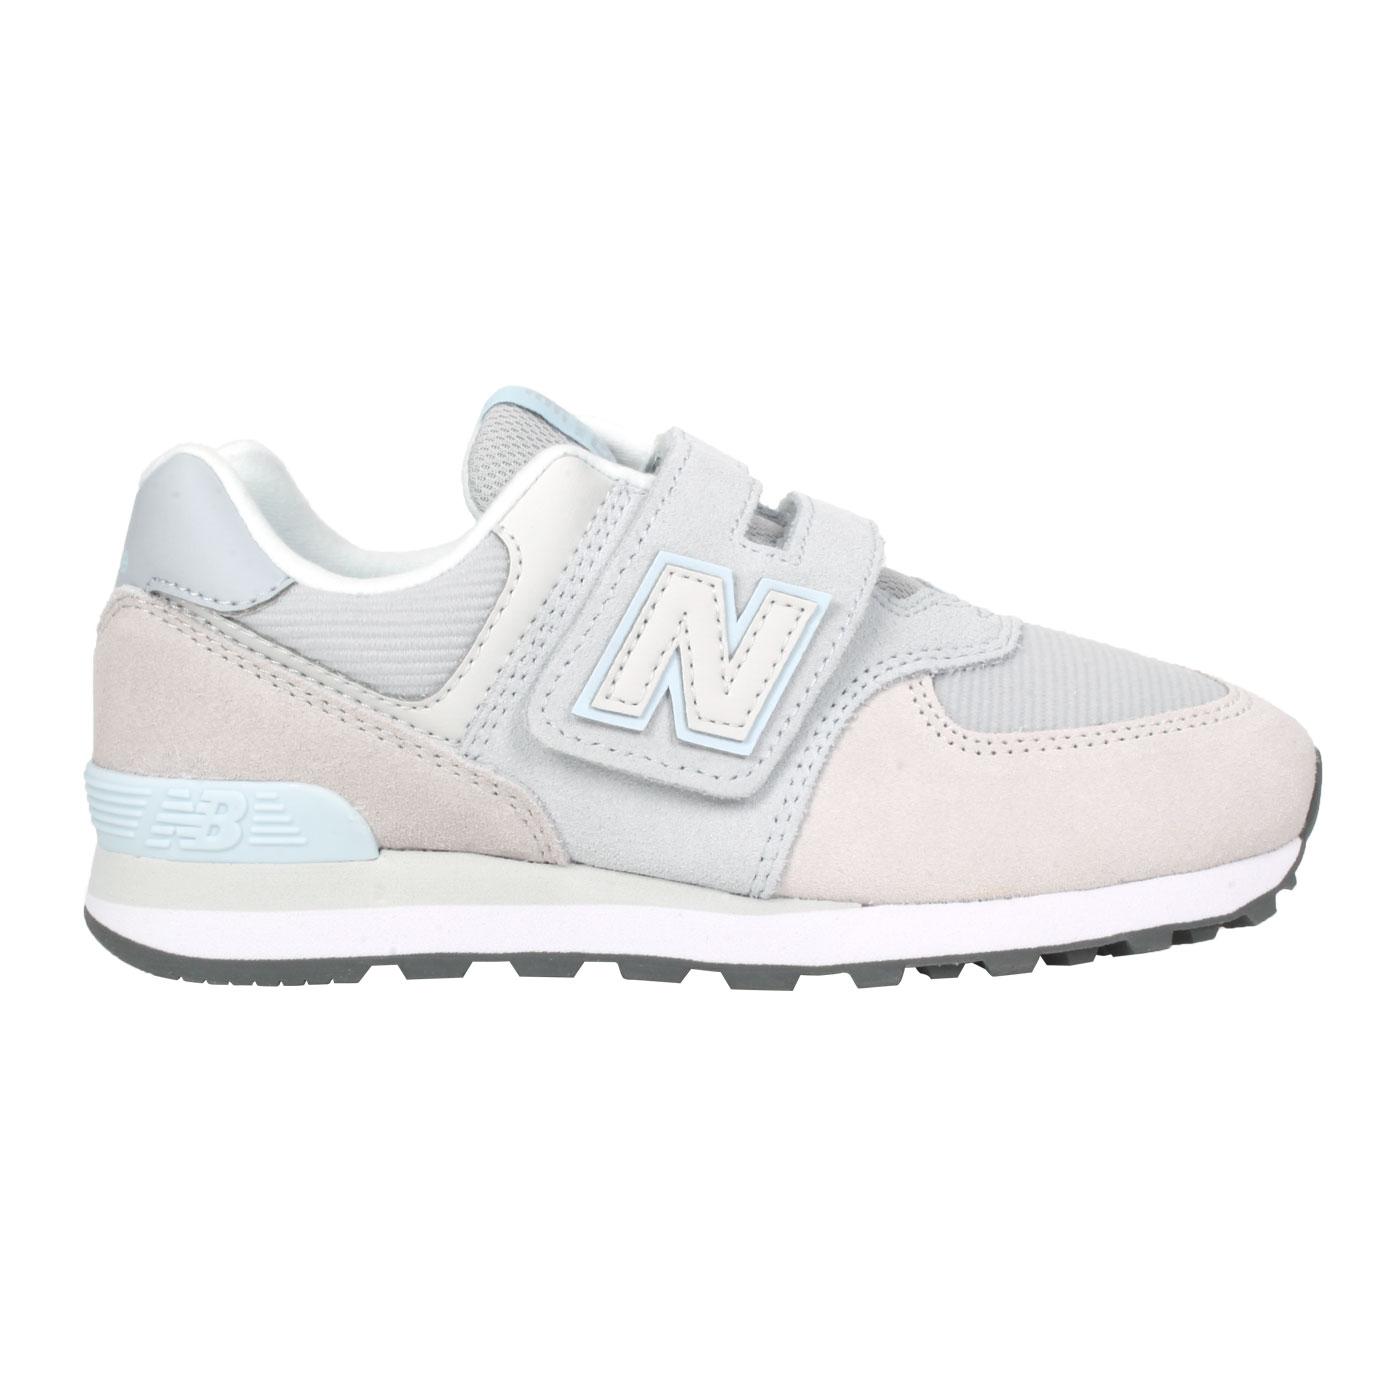 NEW BALANCE 中童休閒運動鞋-WIDE PV574WN1 - 灰水藍